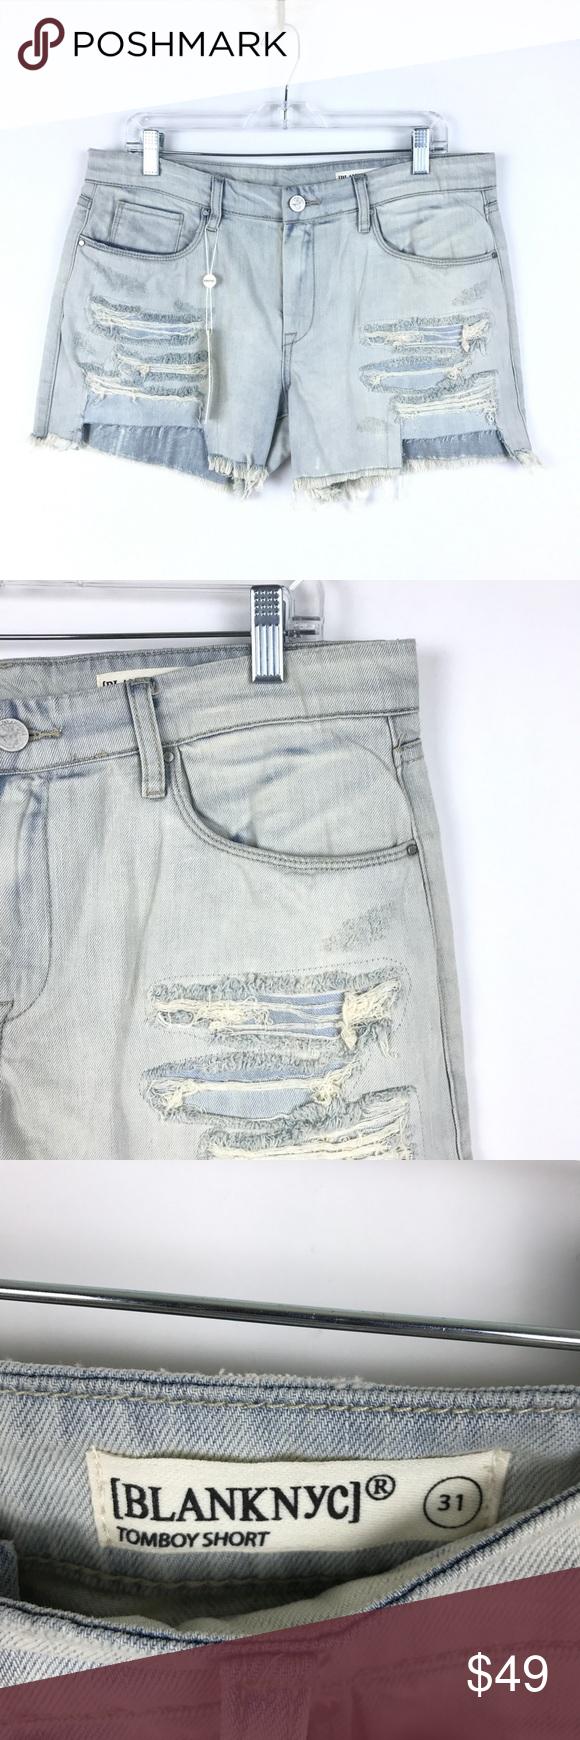 d2bf80f53fec Blank NYC cutoff Denim Tomboy Shorts NEW Blank NYC Cutoff Distressed Denim  Shorts Women's Size Embroidered